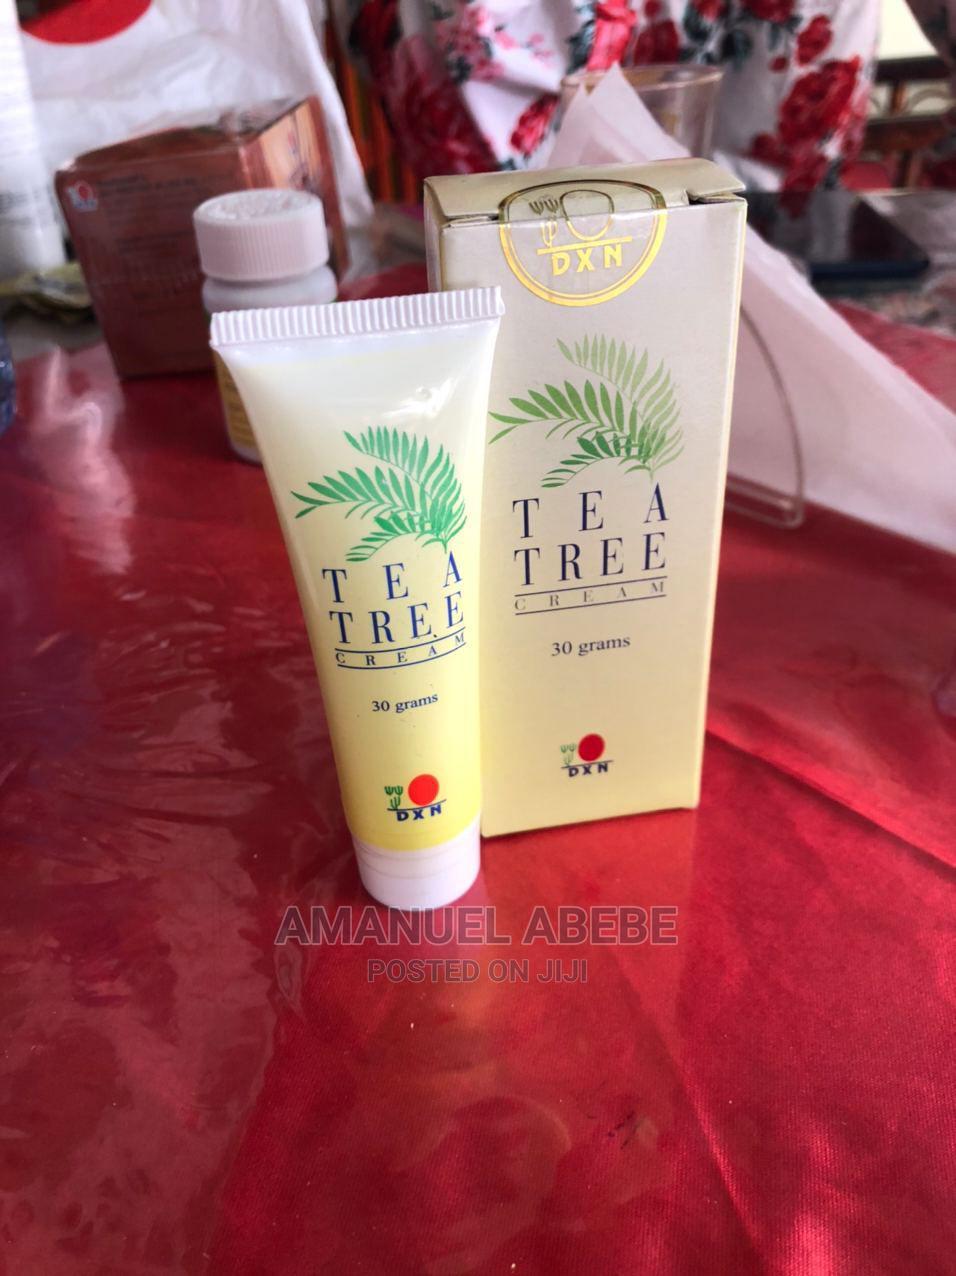 Dxn Tea Tree Cream